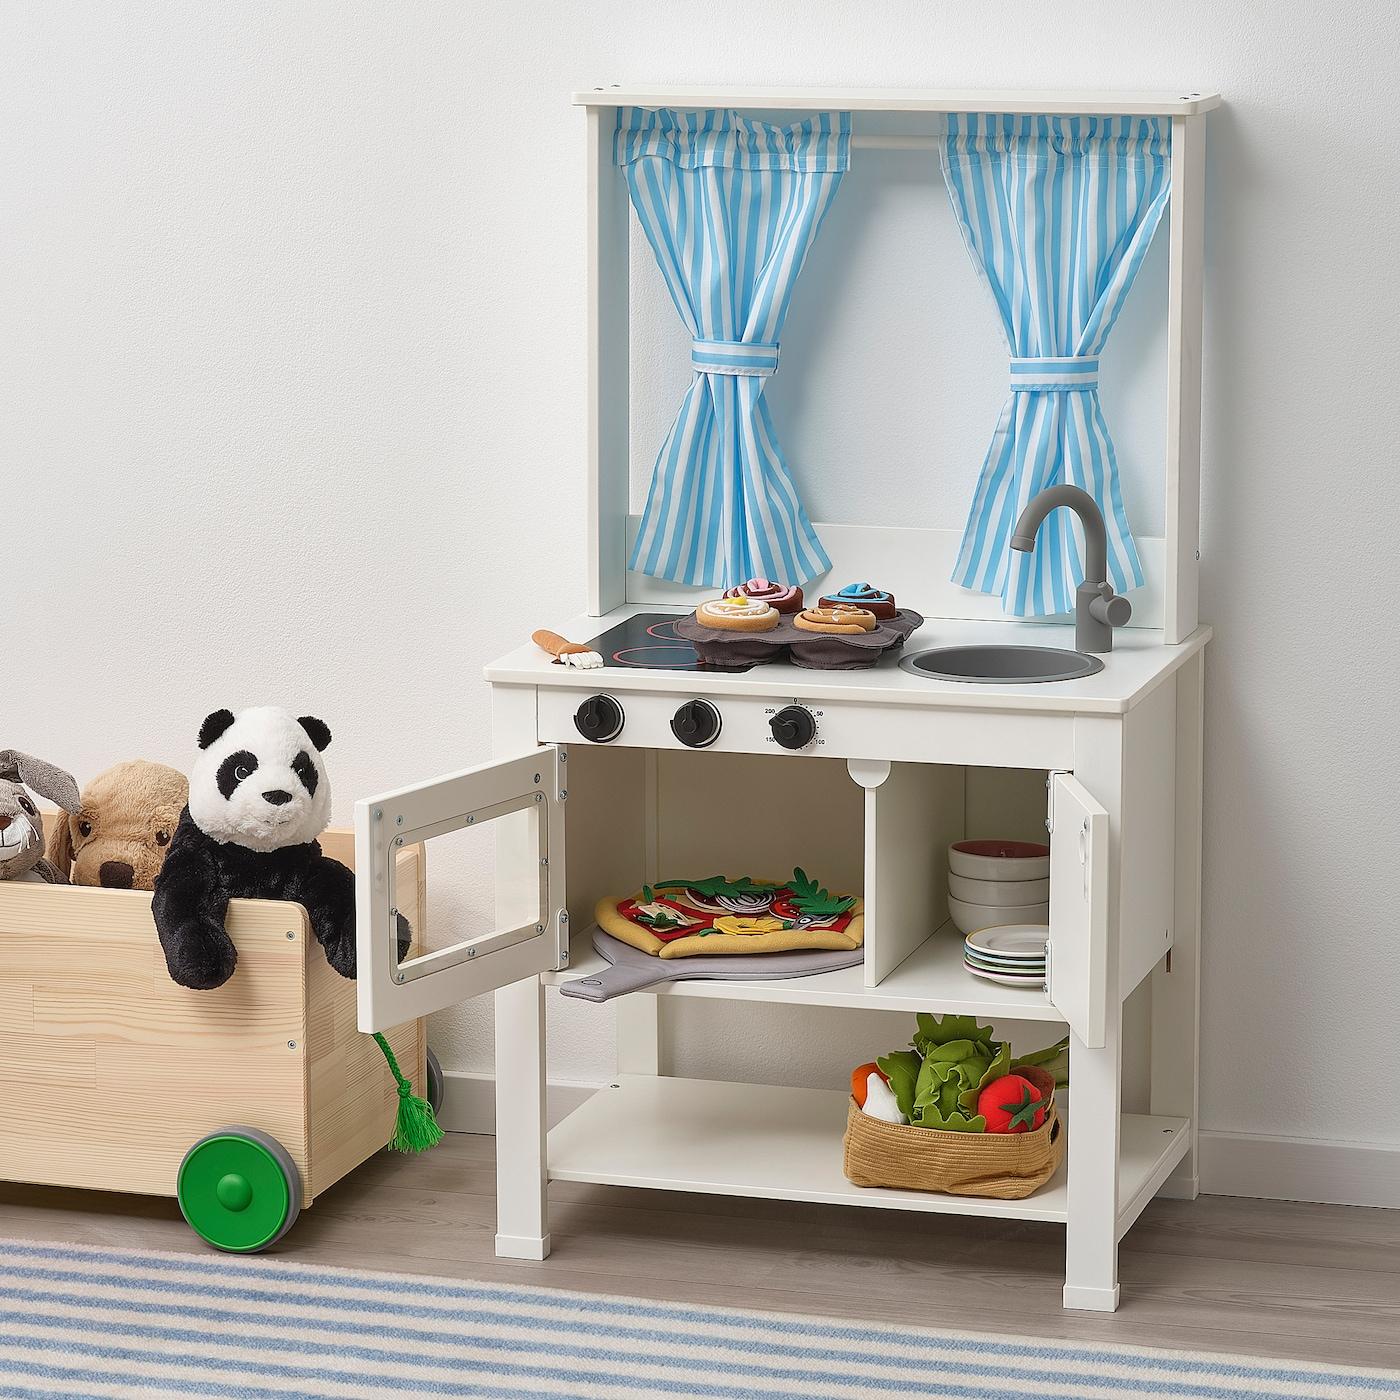 SPISIG Play kitchen with curtains 8x8x8 cm